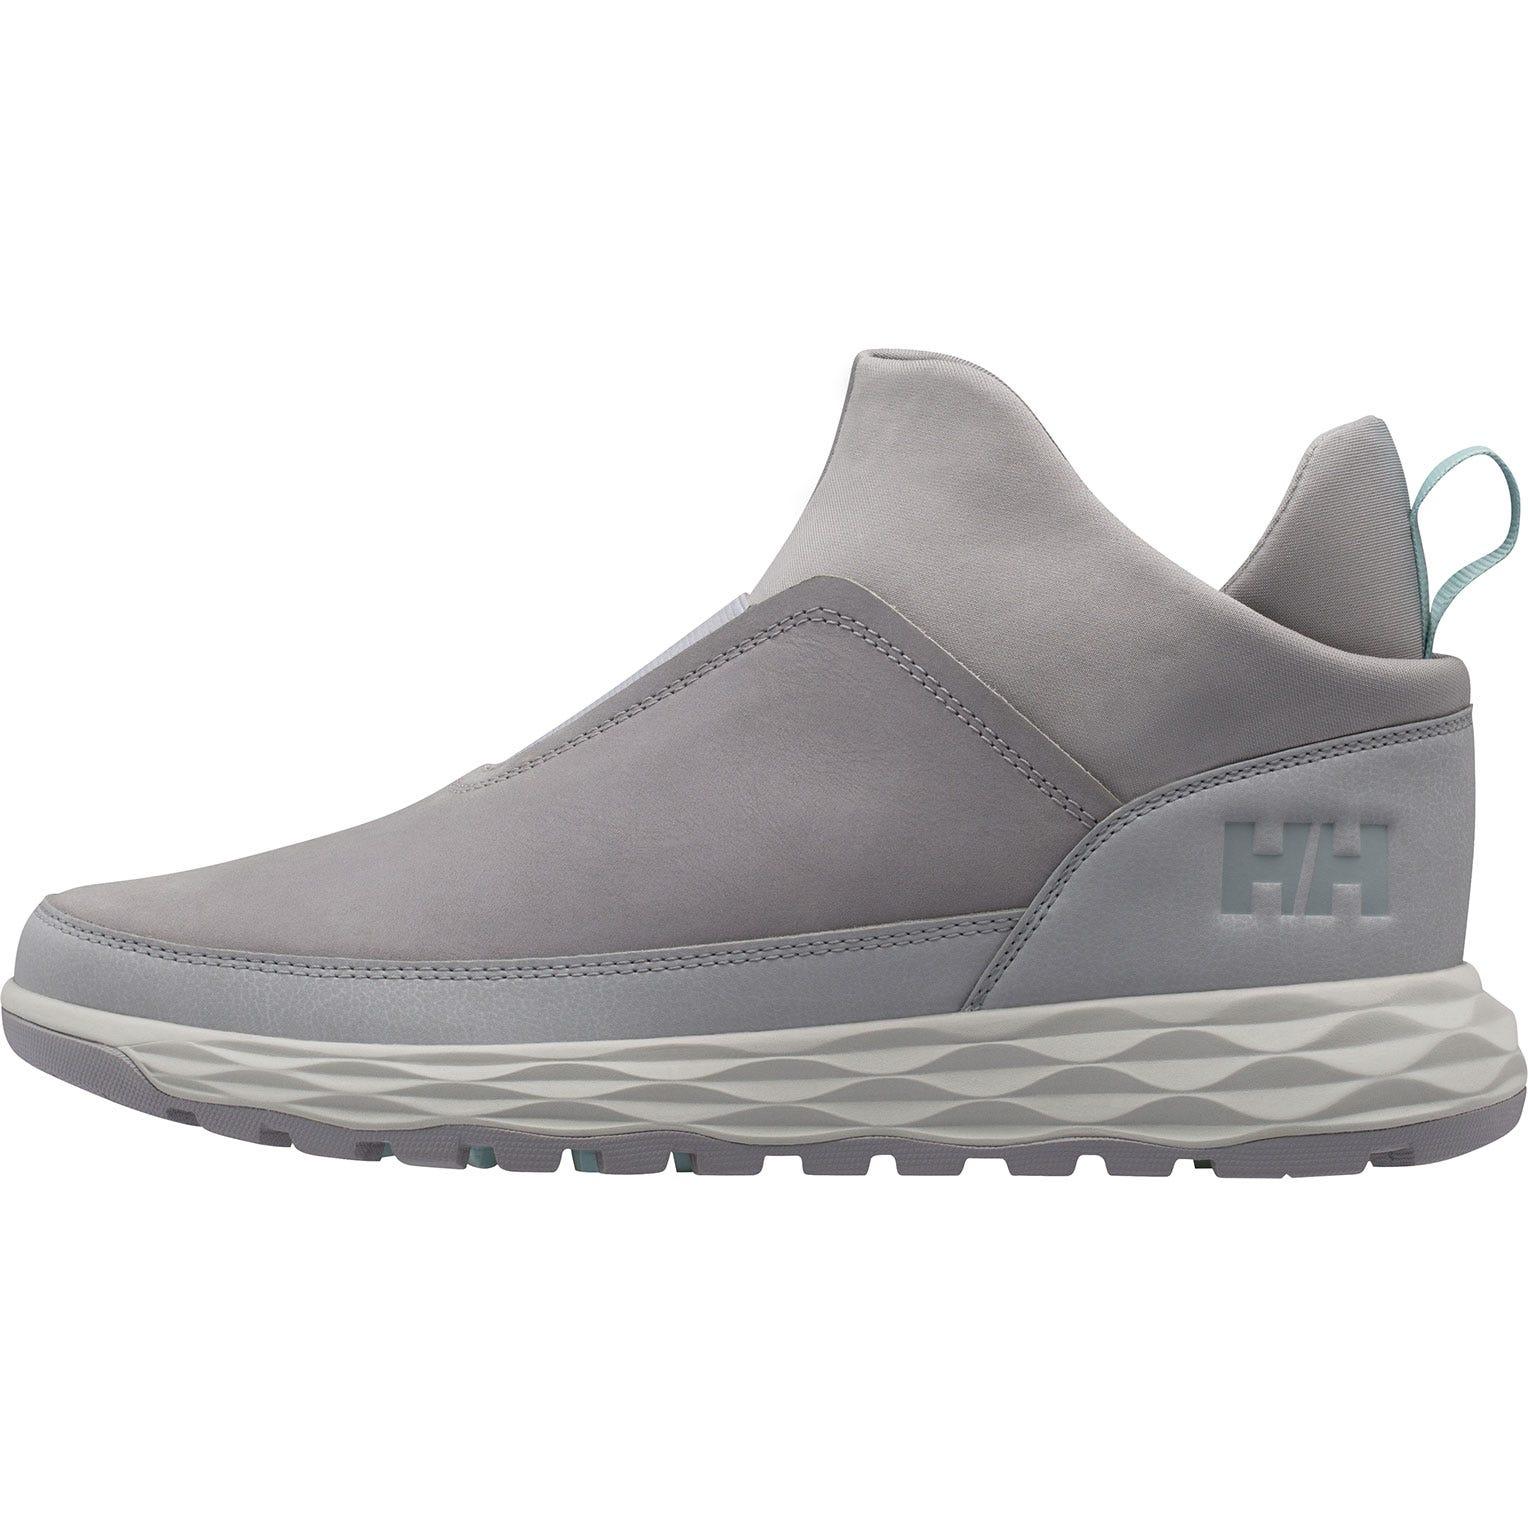 Helly Hansen W Cora Womens Casual Shoe Blue 40.5/9